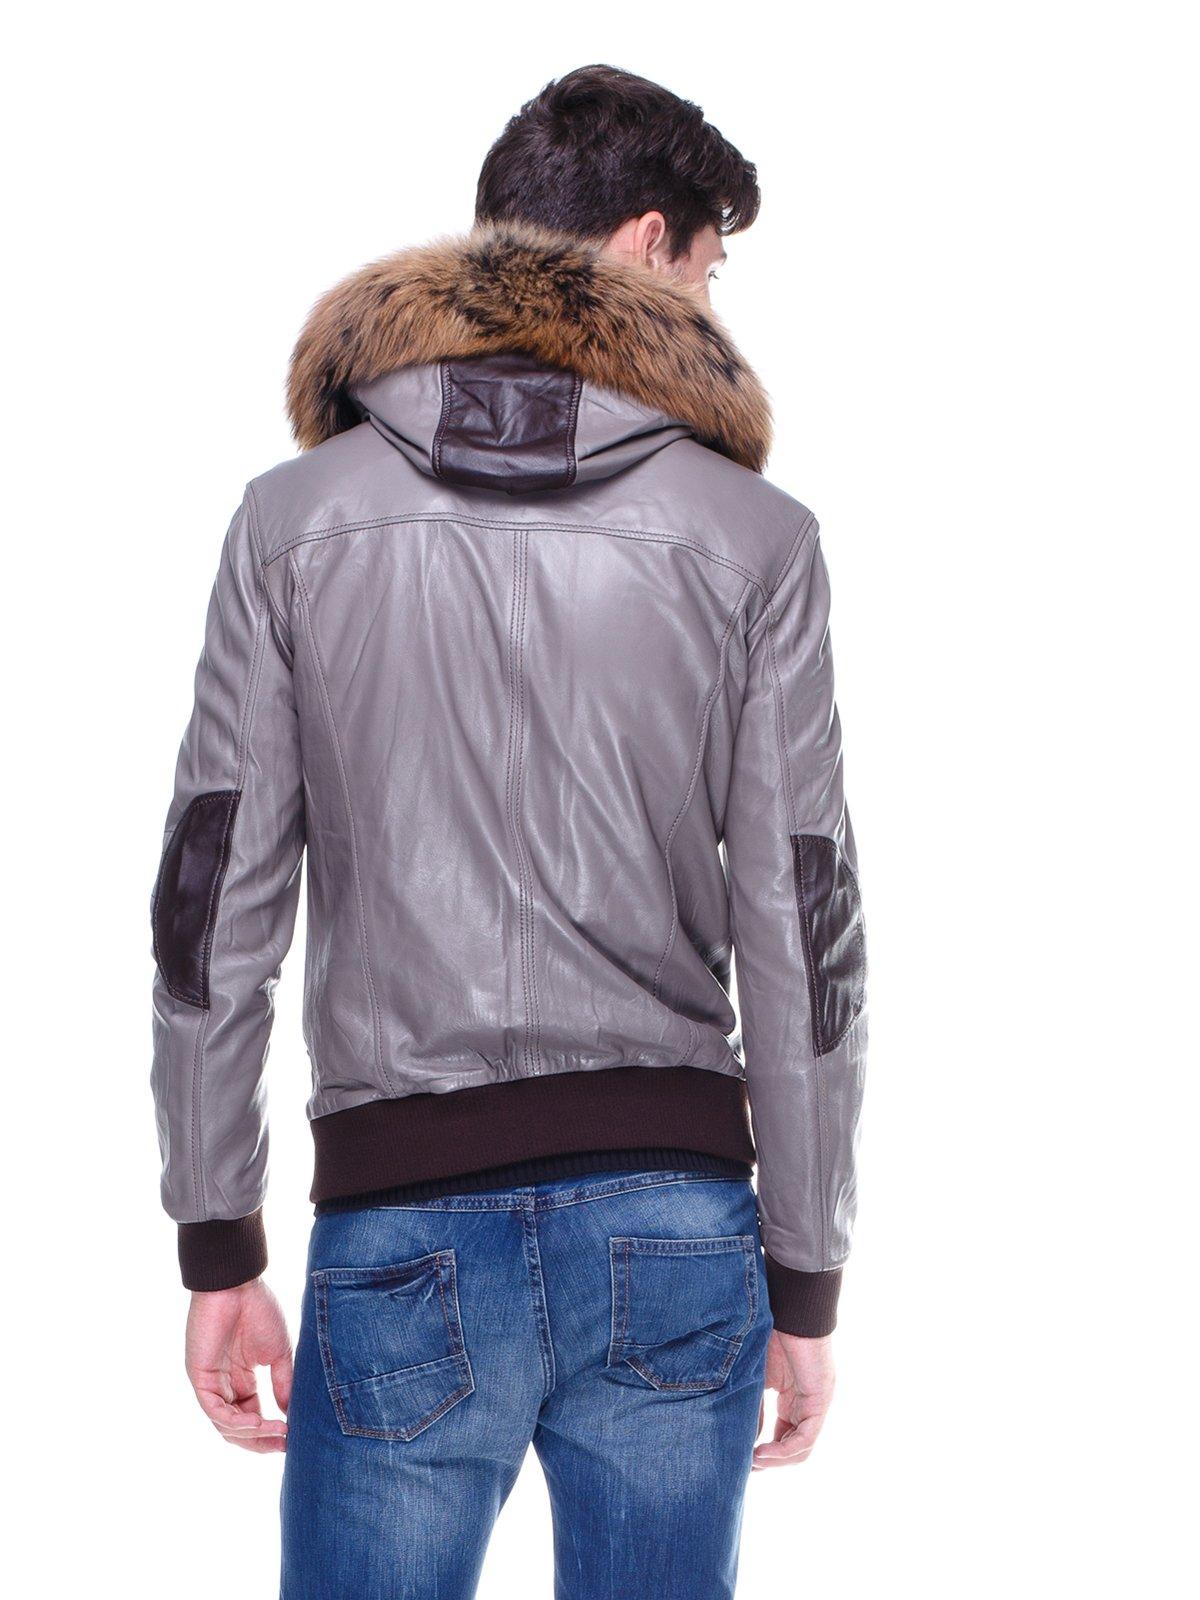 Куртка сіра з оздобленим хутром капюшоном   1830354   фото 2